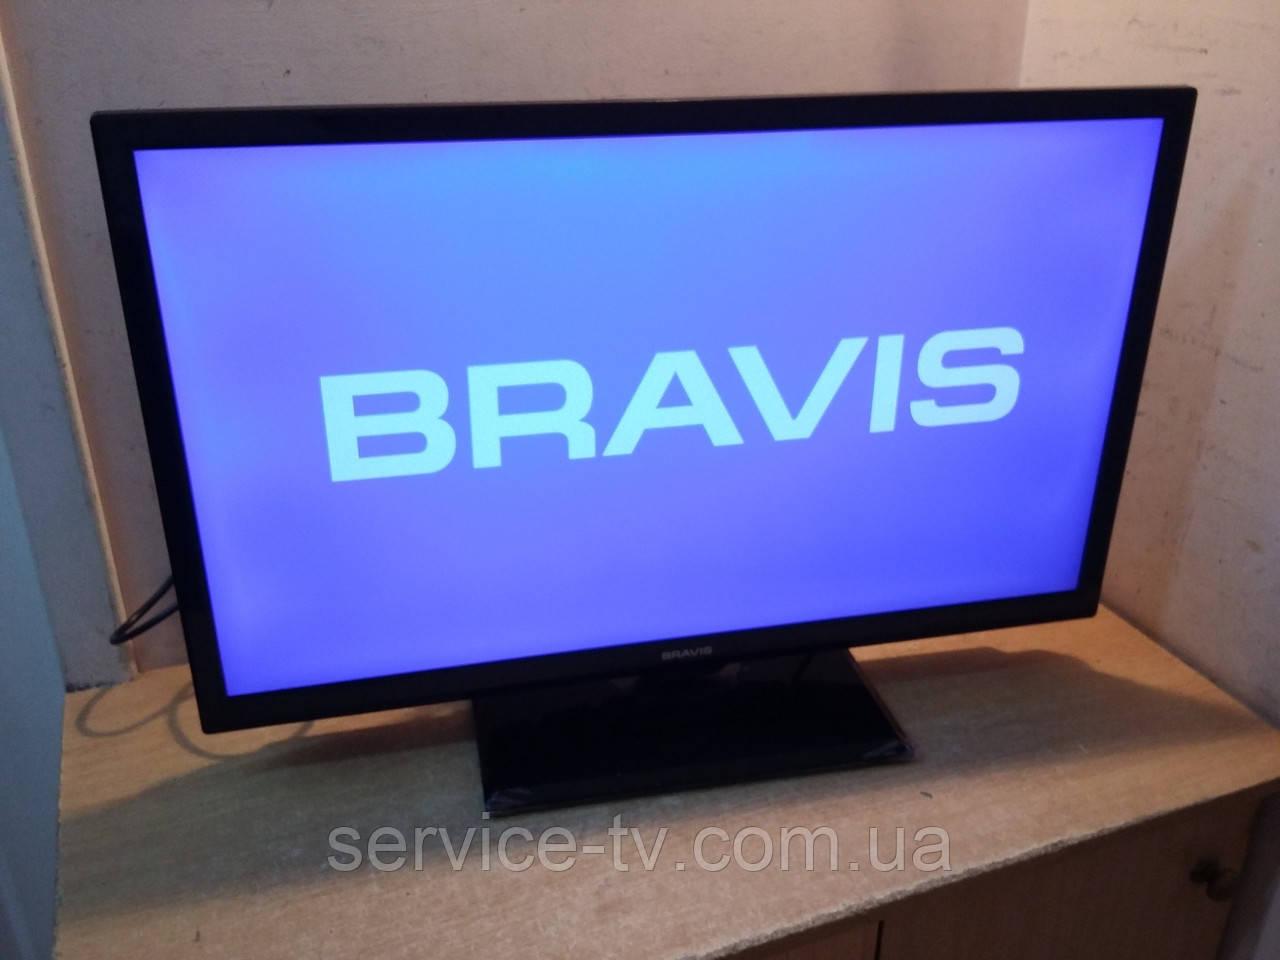 Ремонт ЖК (LCD/LED) телевизоров LG, Samsung, Philips, Bravis и др. Ремонт подсветки матрицы.